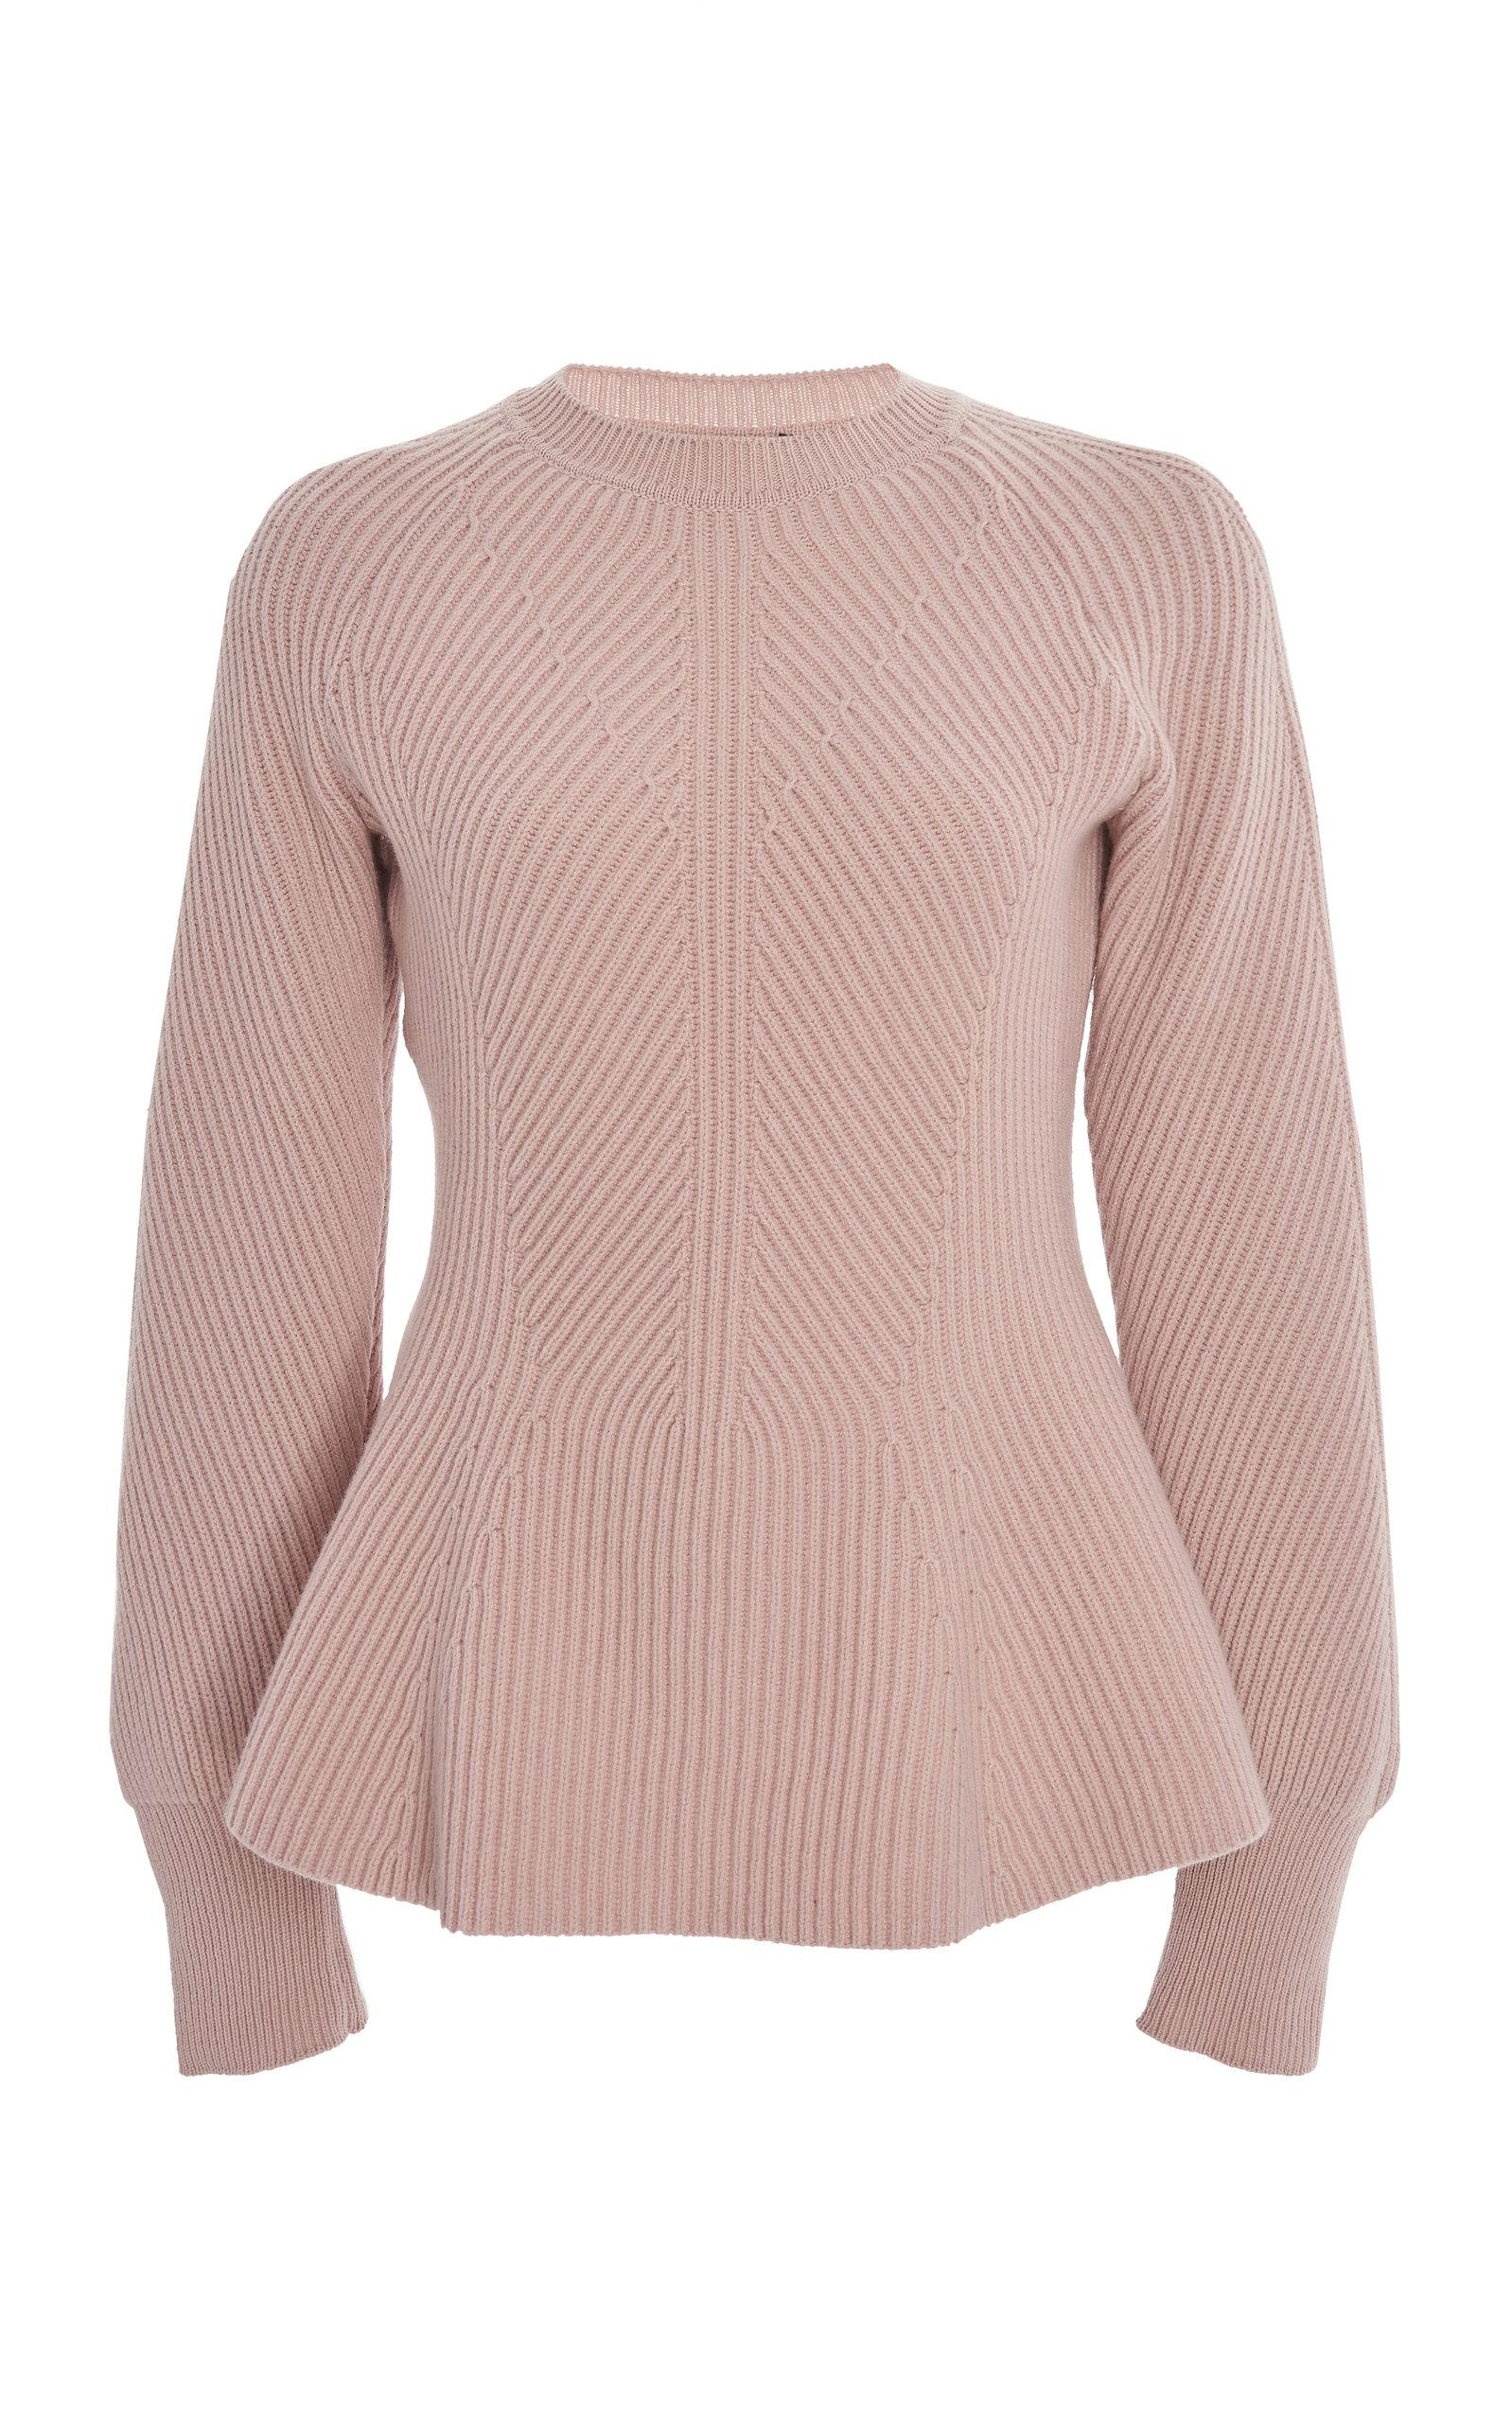 promo code 7194b dfe4f alberta-ferretti-pink-Wool-Cashmere-Peplum-Sweater.jpeg